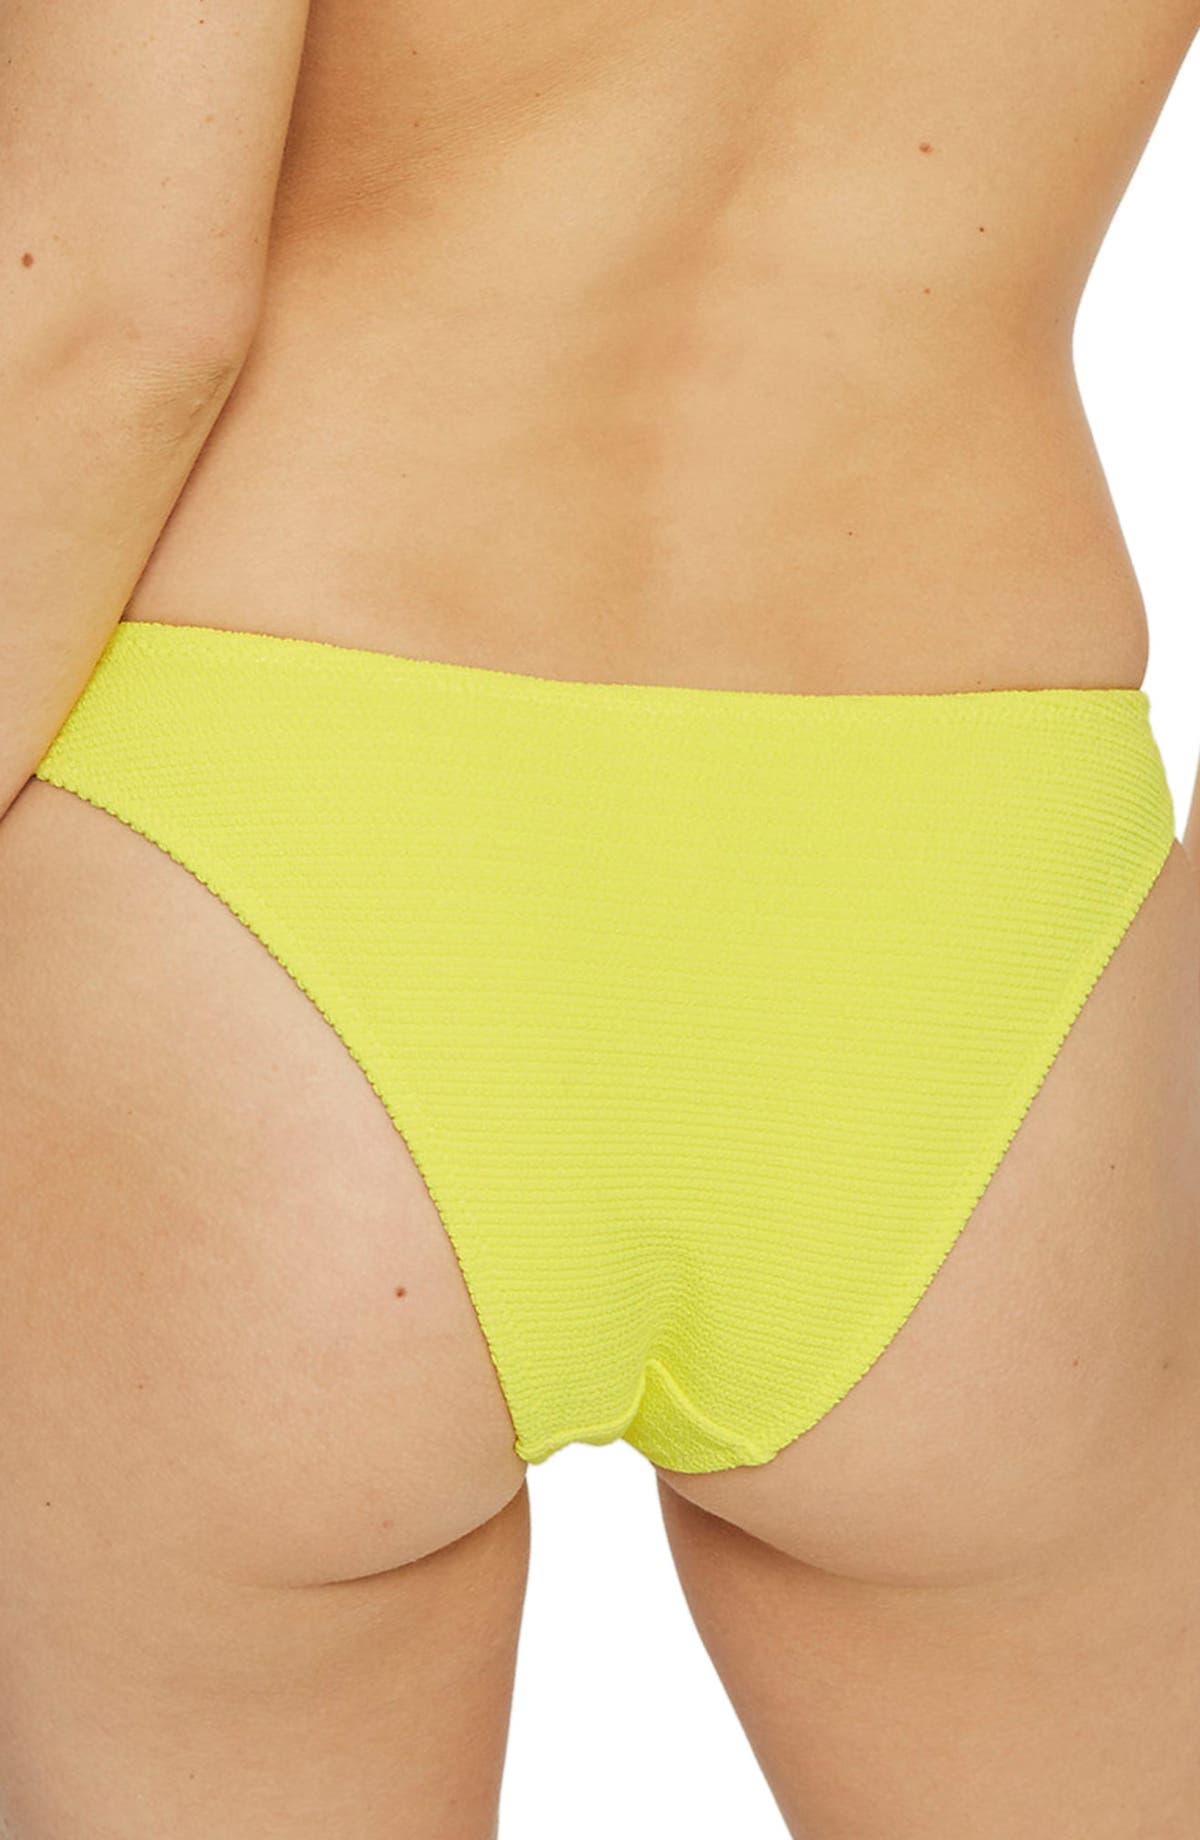 c9e95ff716 Topshop Crinkle Classic Low Rise Bikini Bottoms